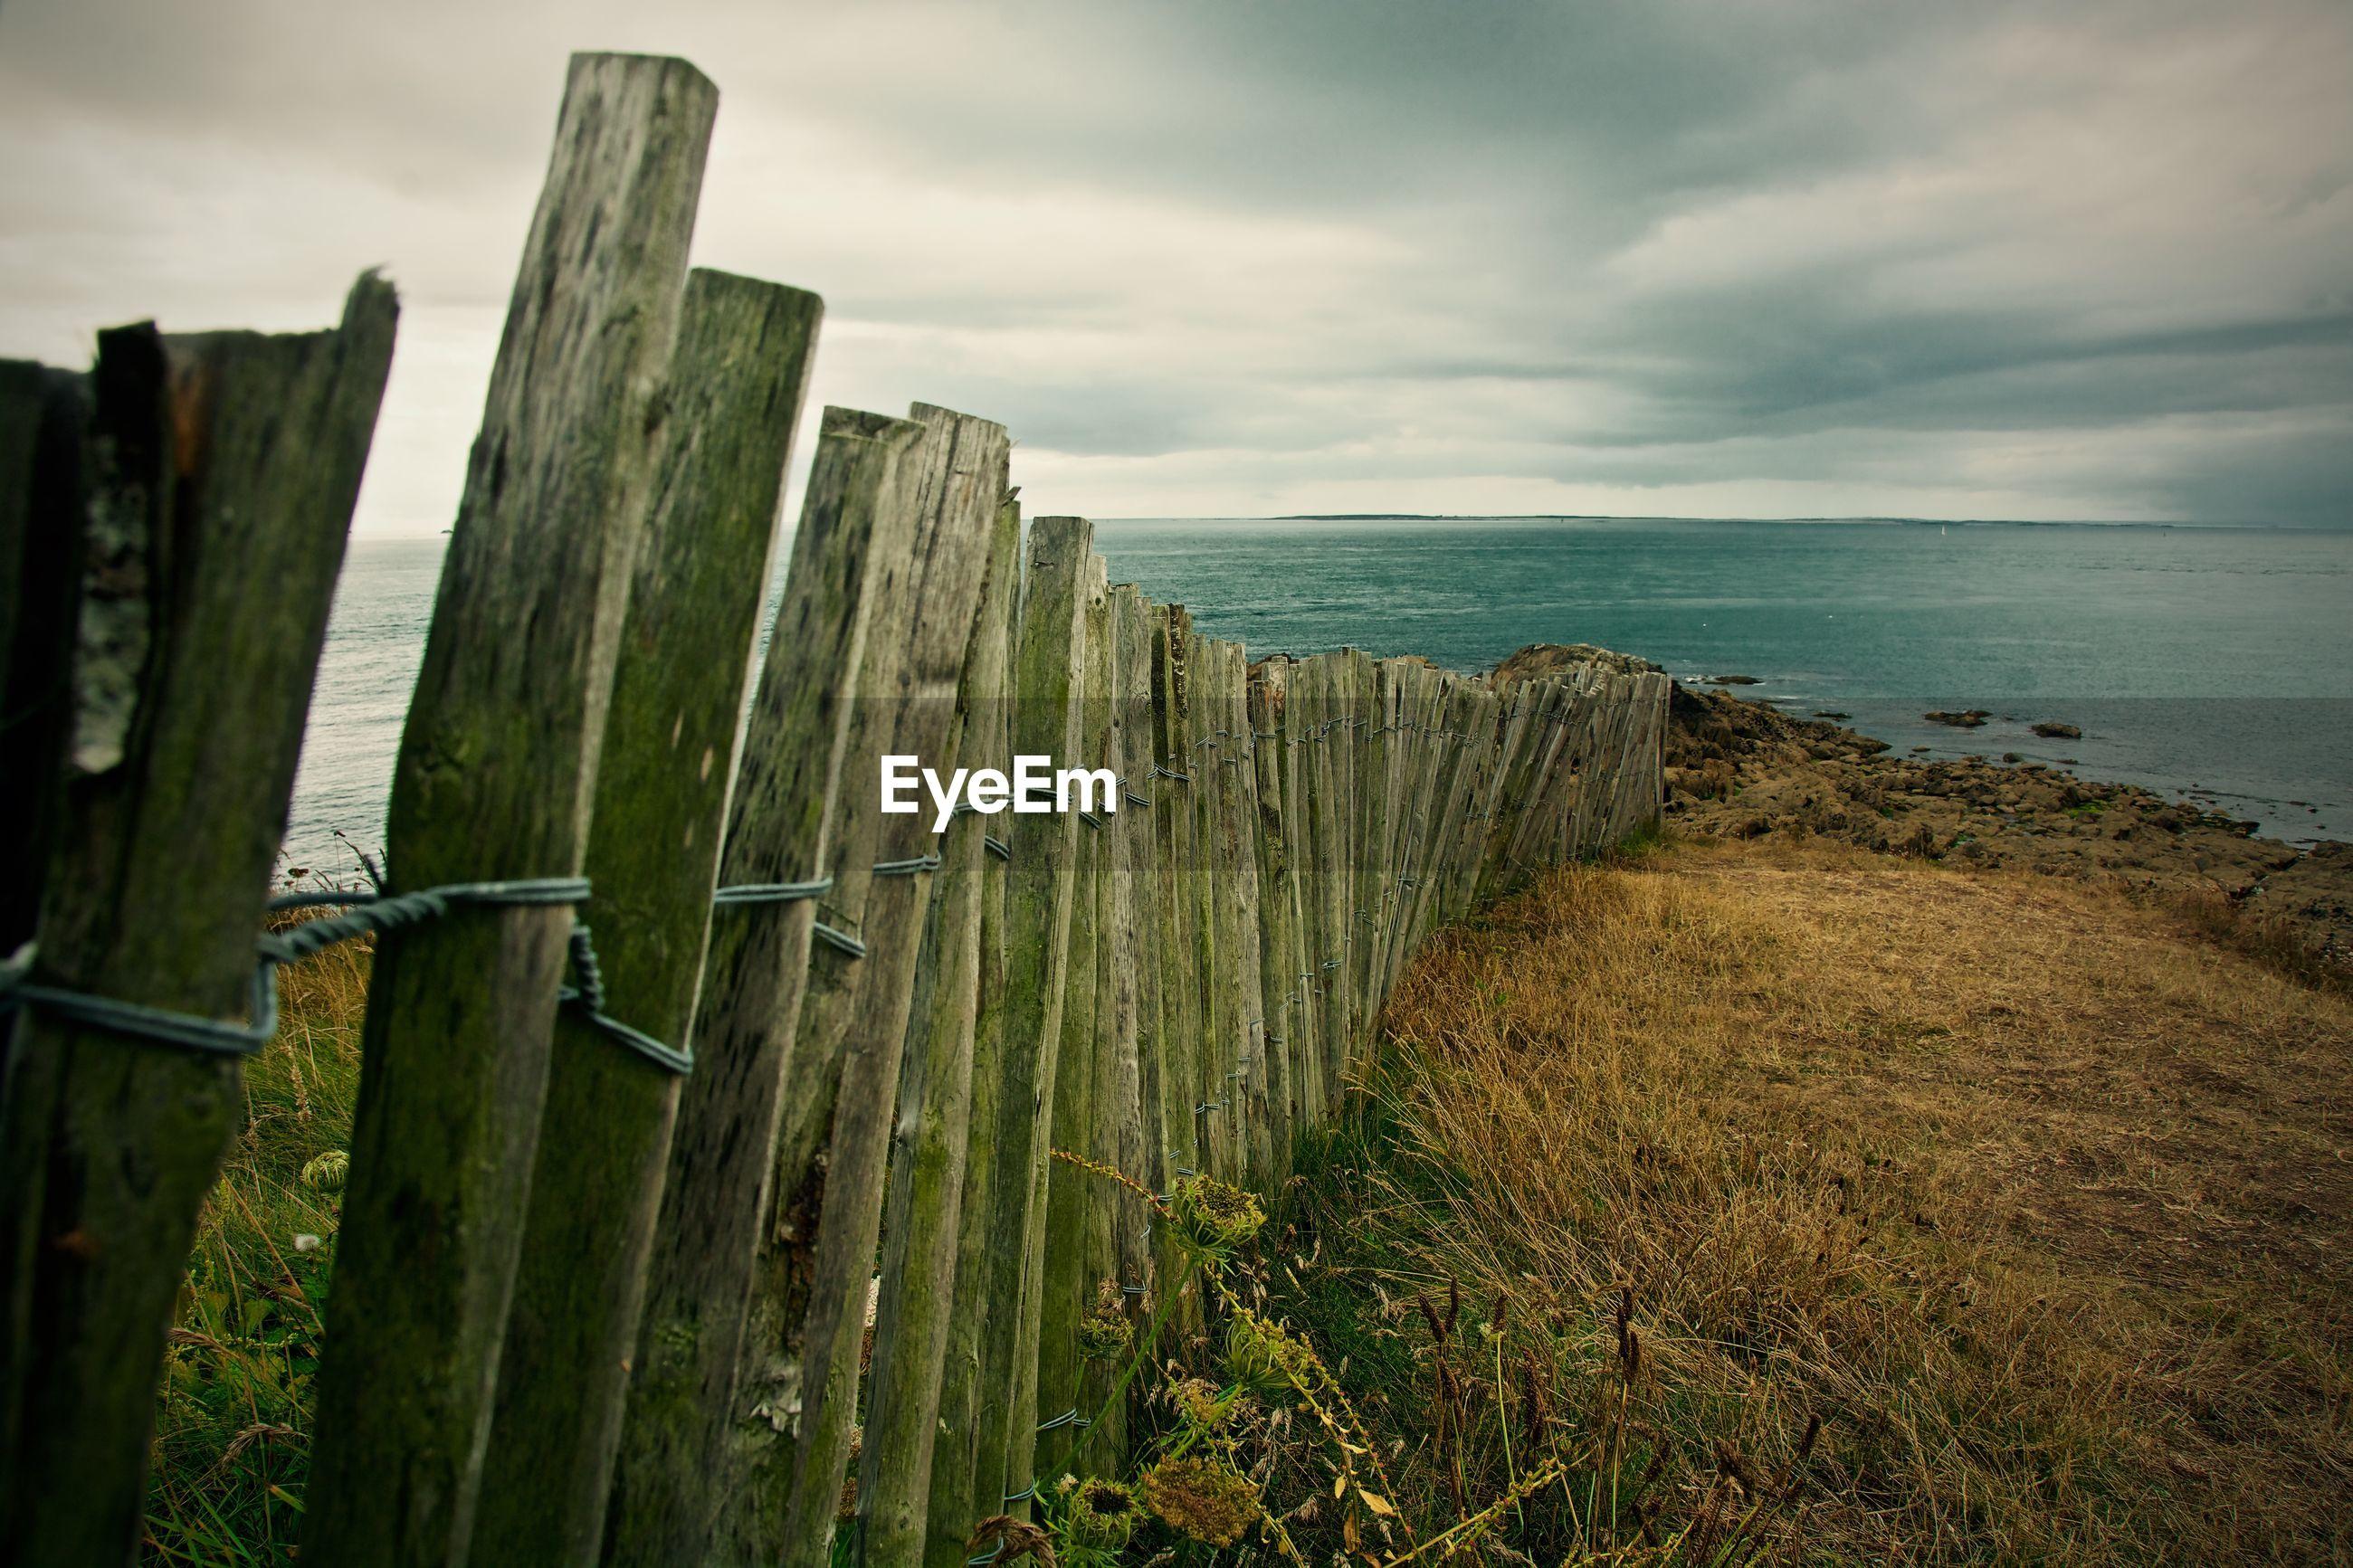 Wooden fence on beach against cloudy sky